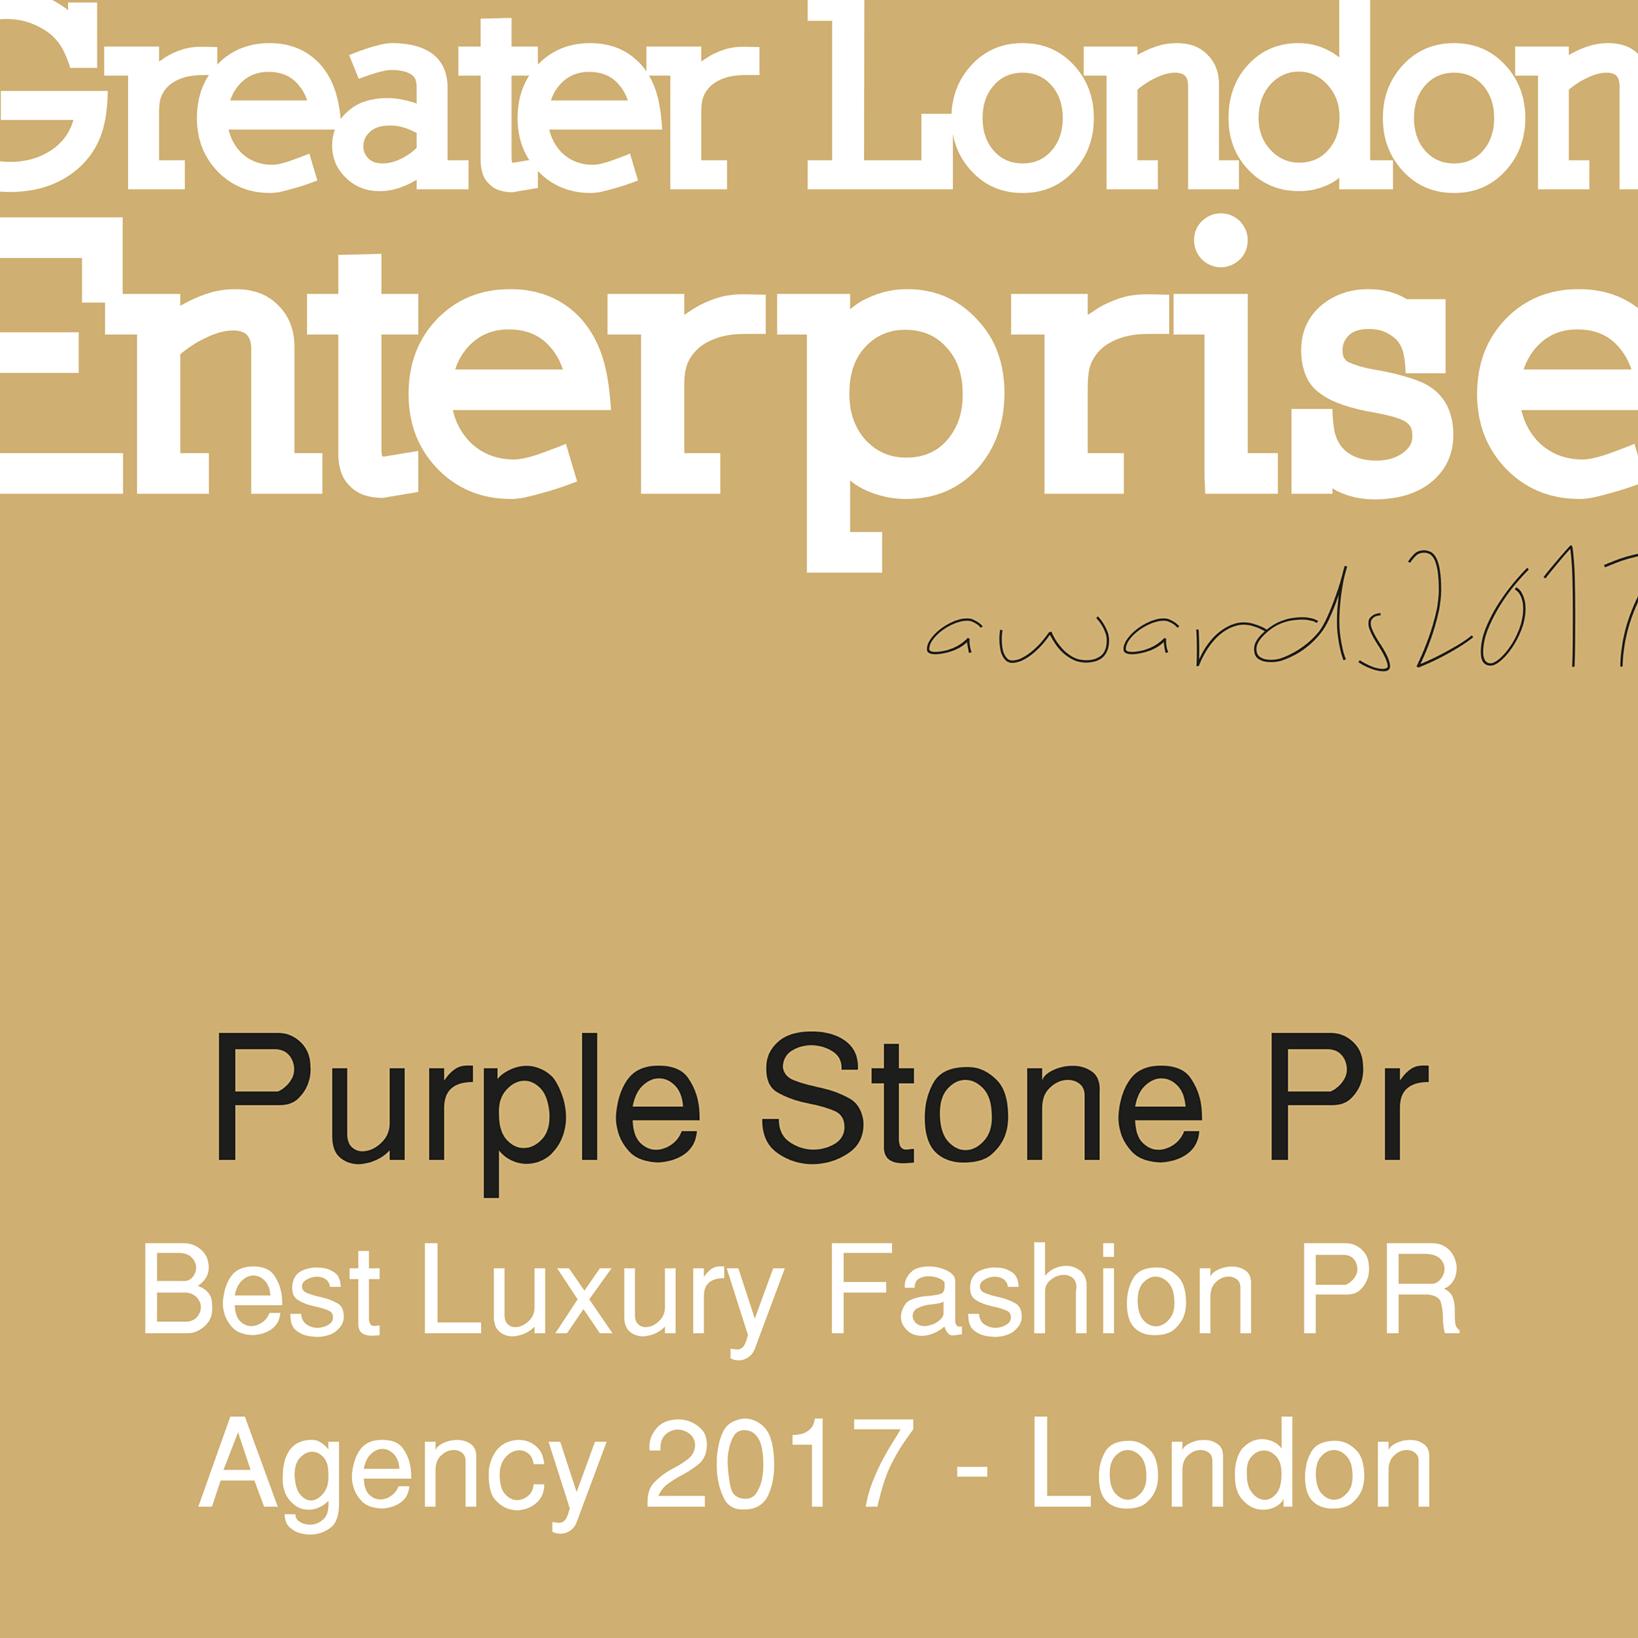 Best Luxury Fashion PR Agency 2017 London - Purple Stone PR - SME Awards.png